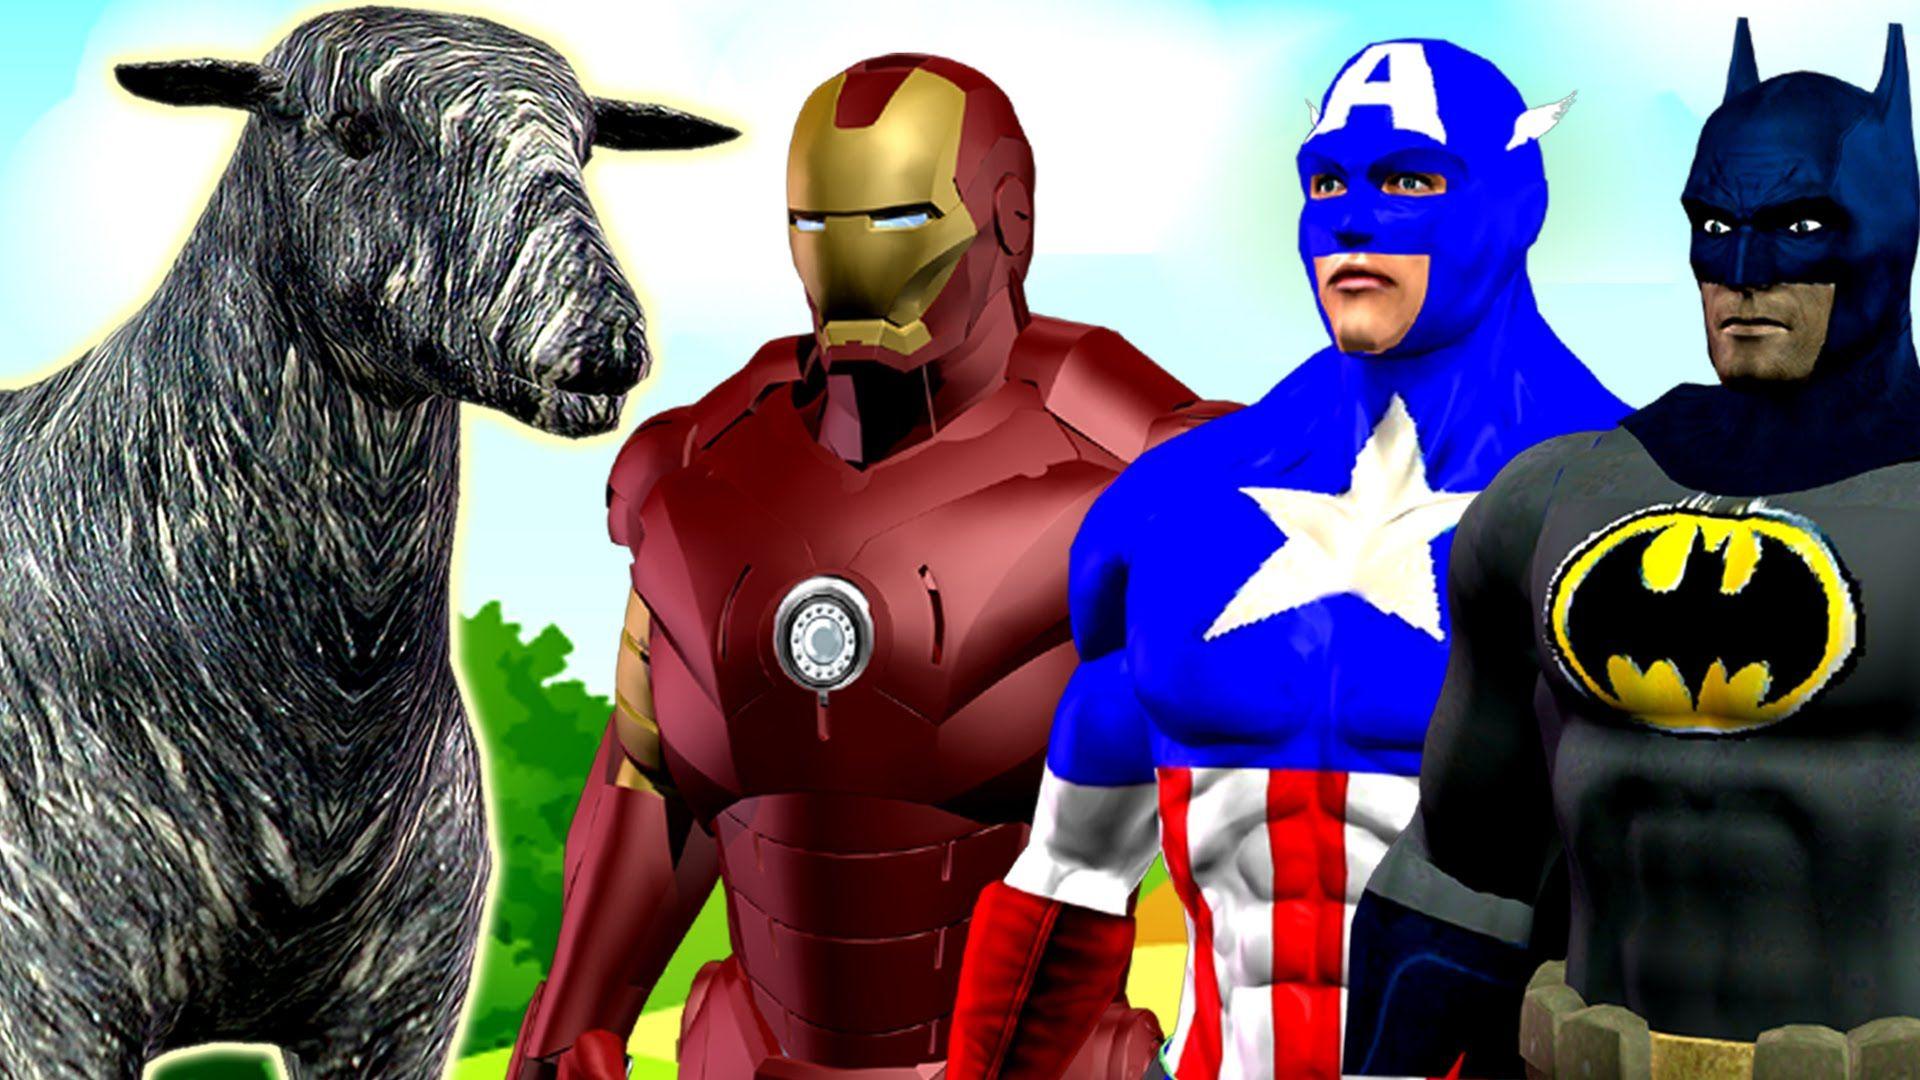 Ironman Captain America Cartoons for Children Nursery Rhymes | Baa Baa B...